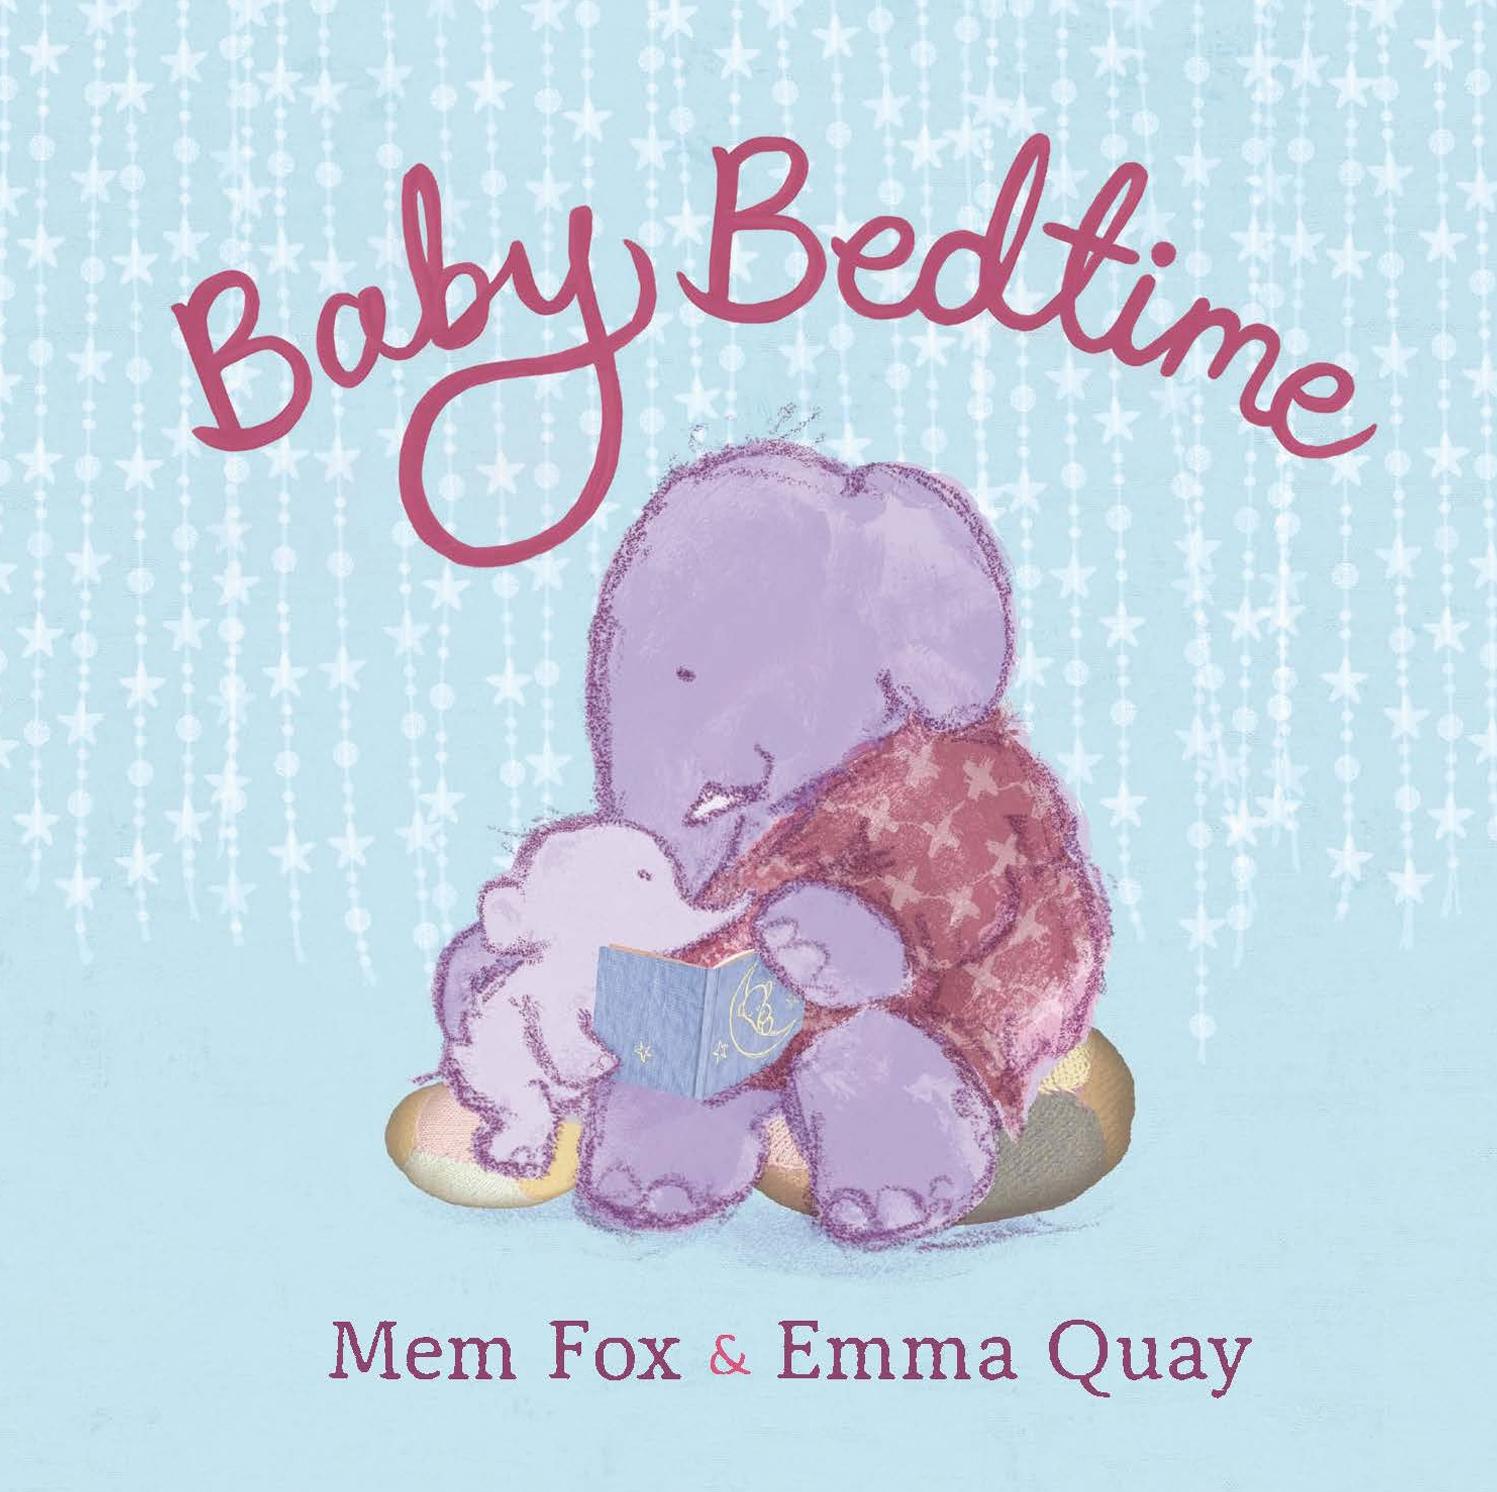 NEW IN PAPERBACK, OCTOBER 2018  — BABY BEDTIME by Mem Fox and Emma Quay (Viking/Penguin Books Australia |   Beach Lane Books, USA)  http://www.emmaquay.com